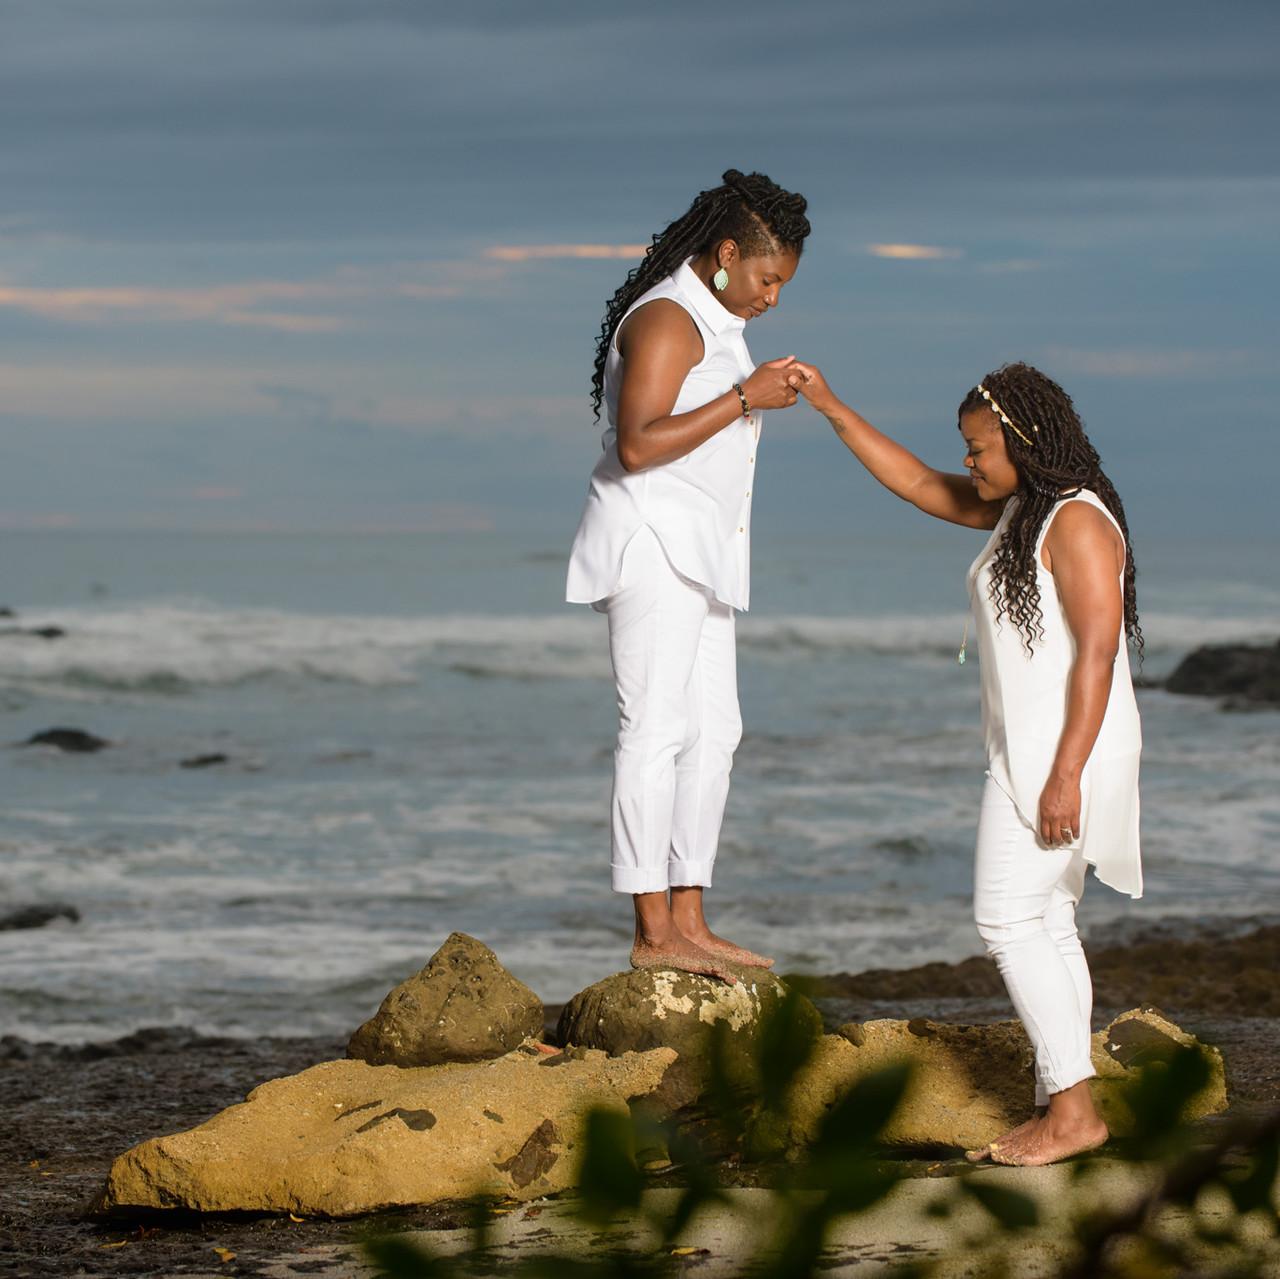 Exploring together at Playa Langosta